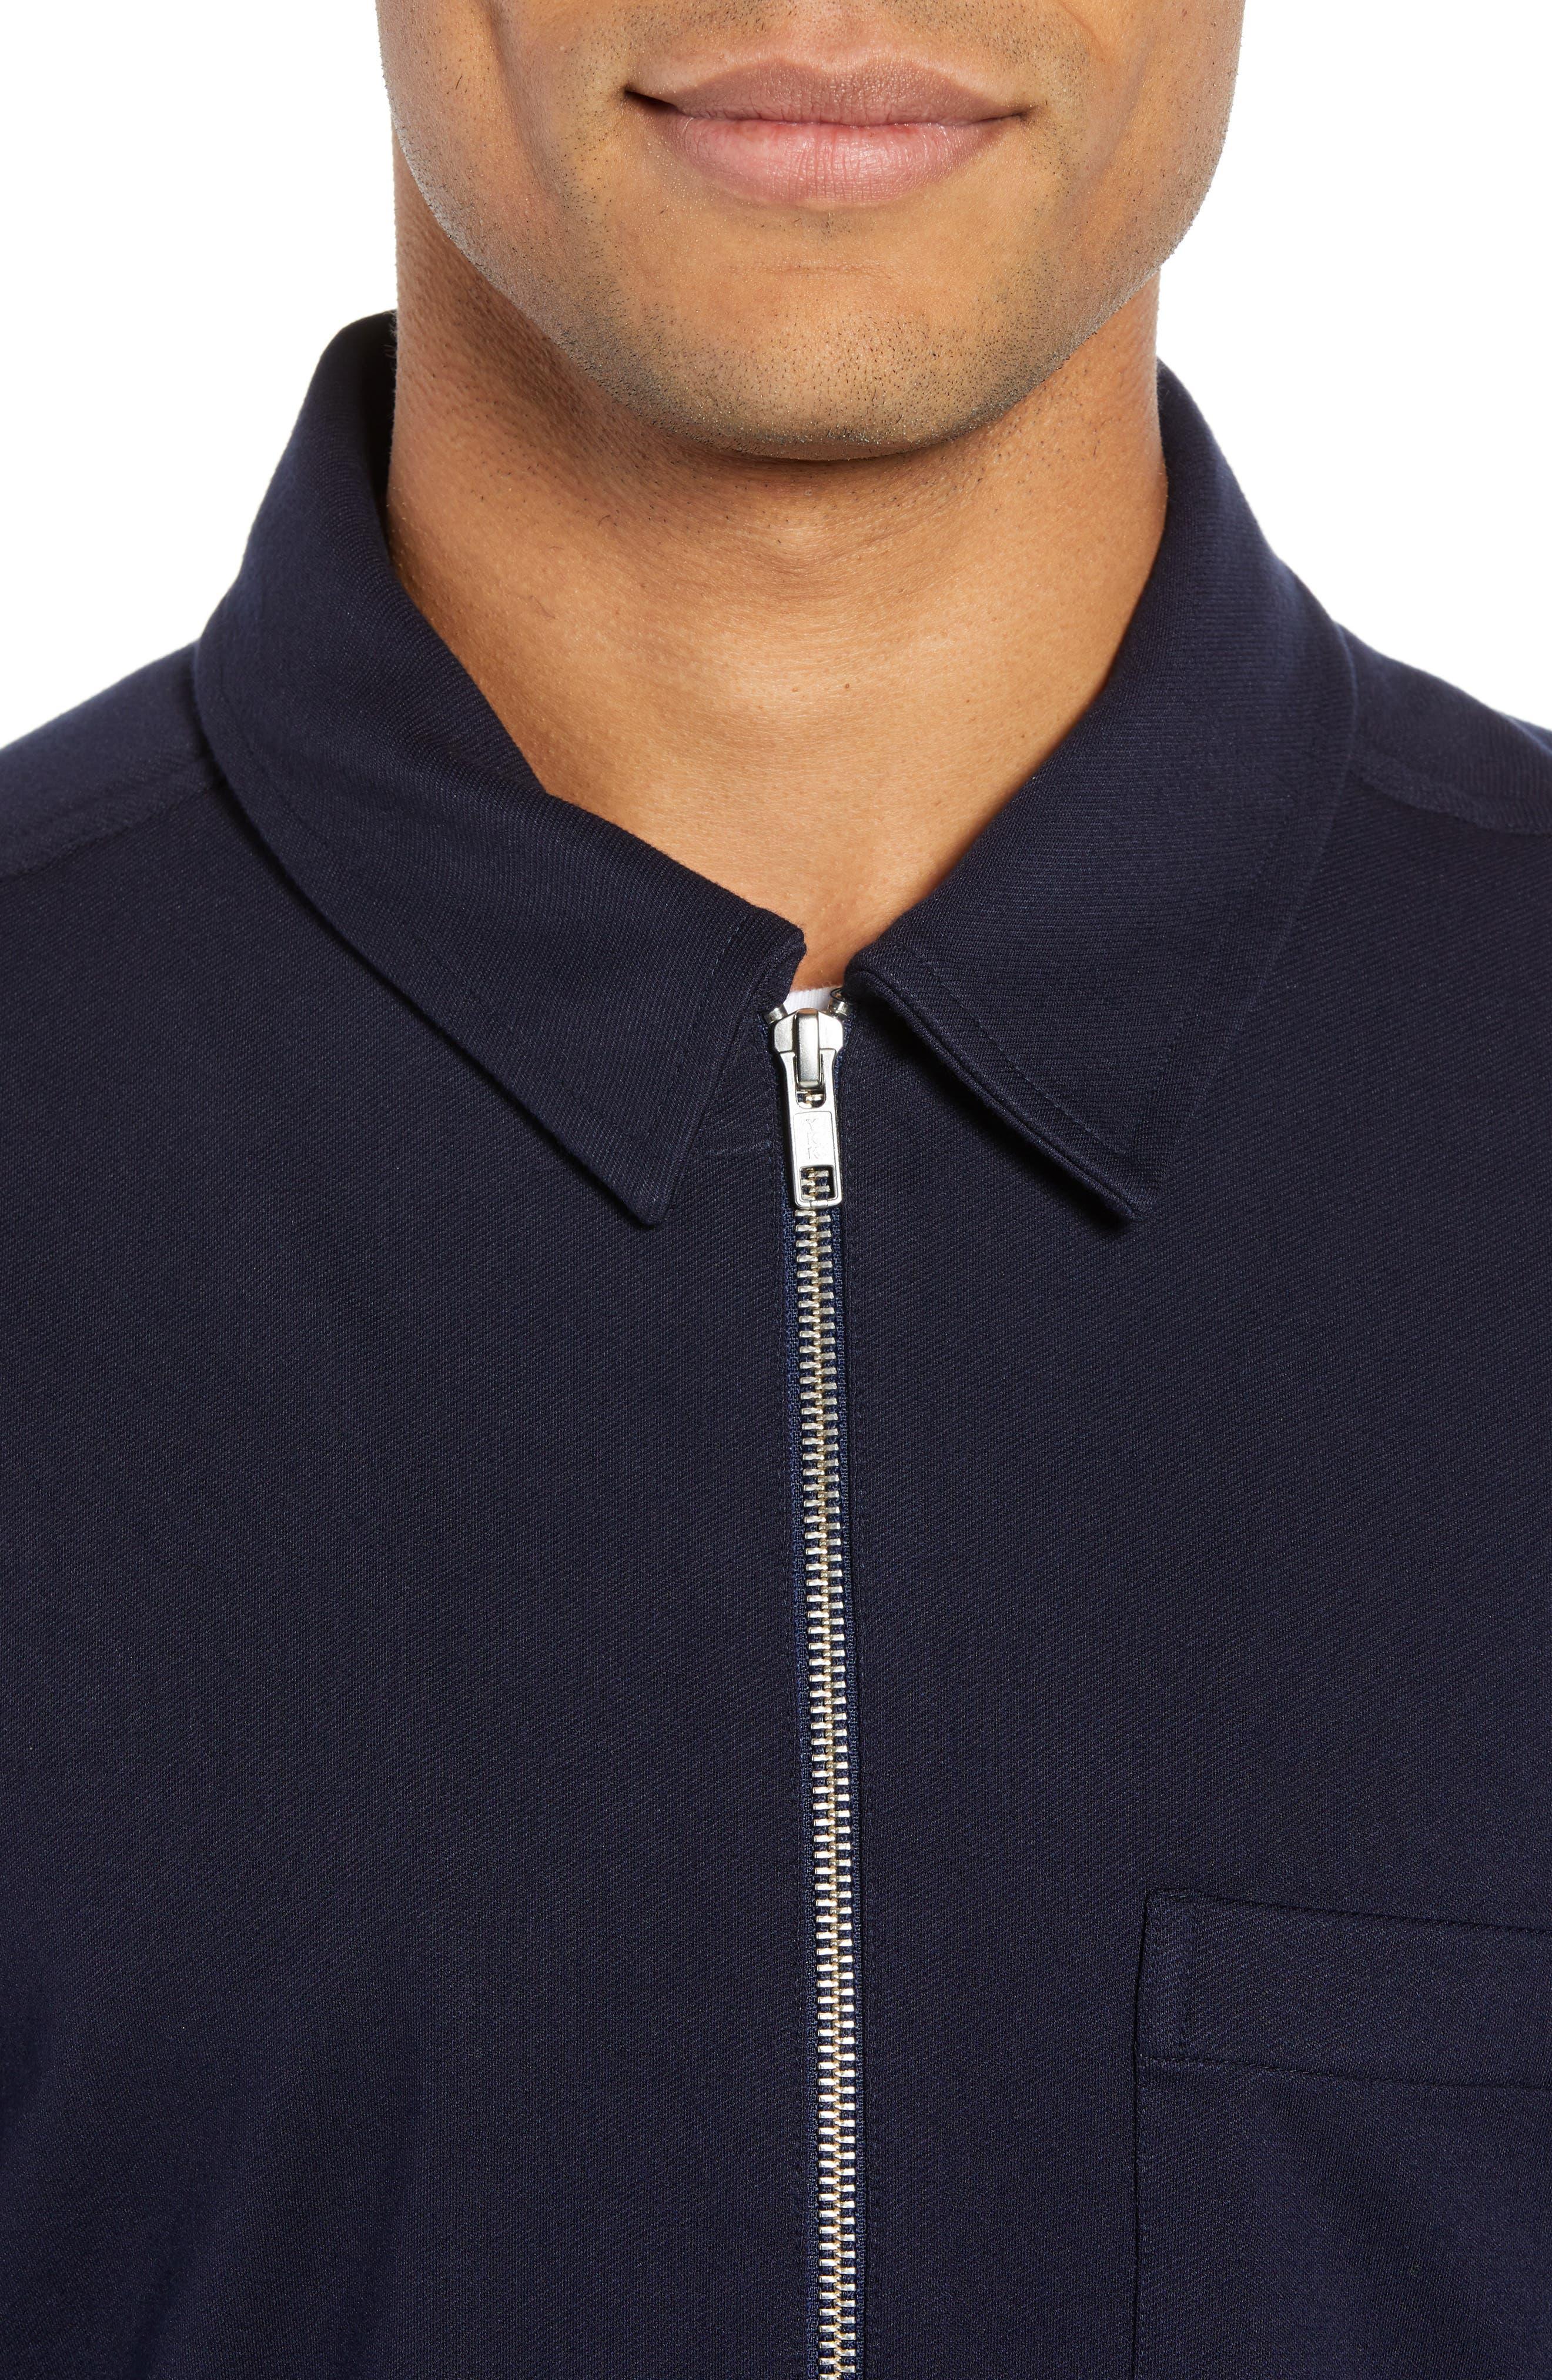 Zip Front Shirt Jacket,                             Alternate thumbnail 4, color,                             NAVY NIGHT